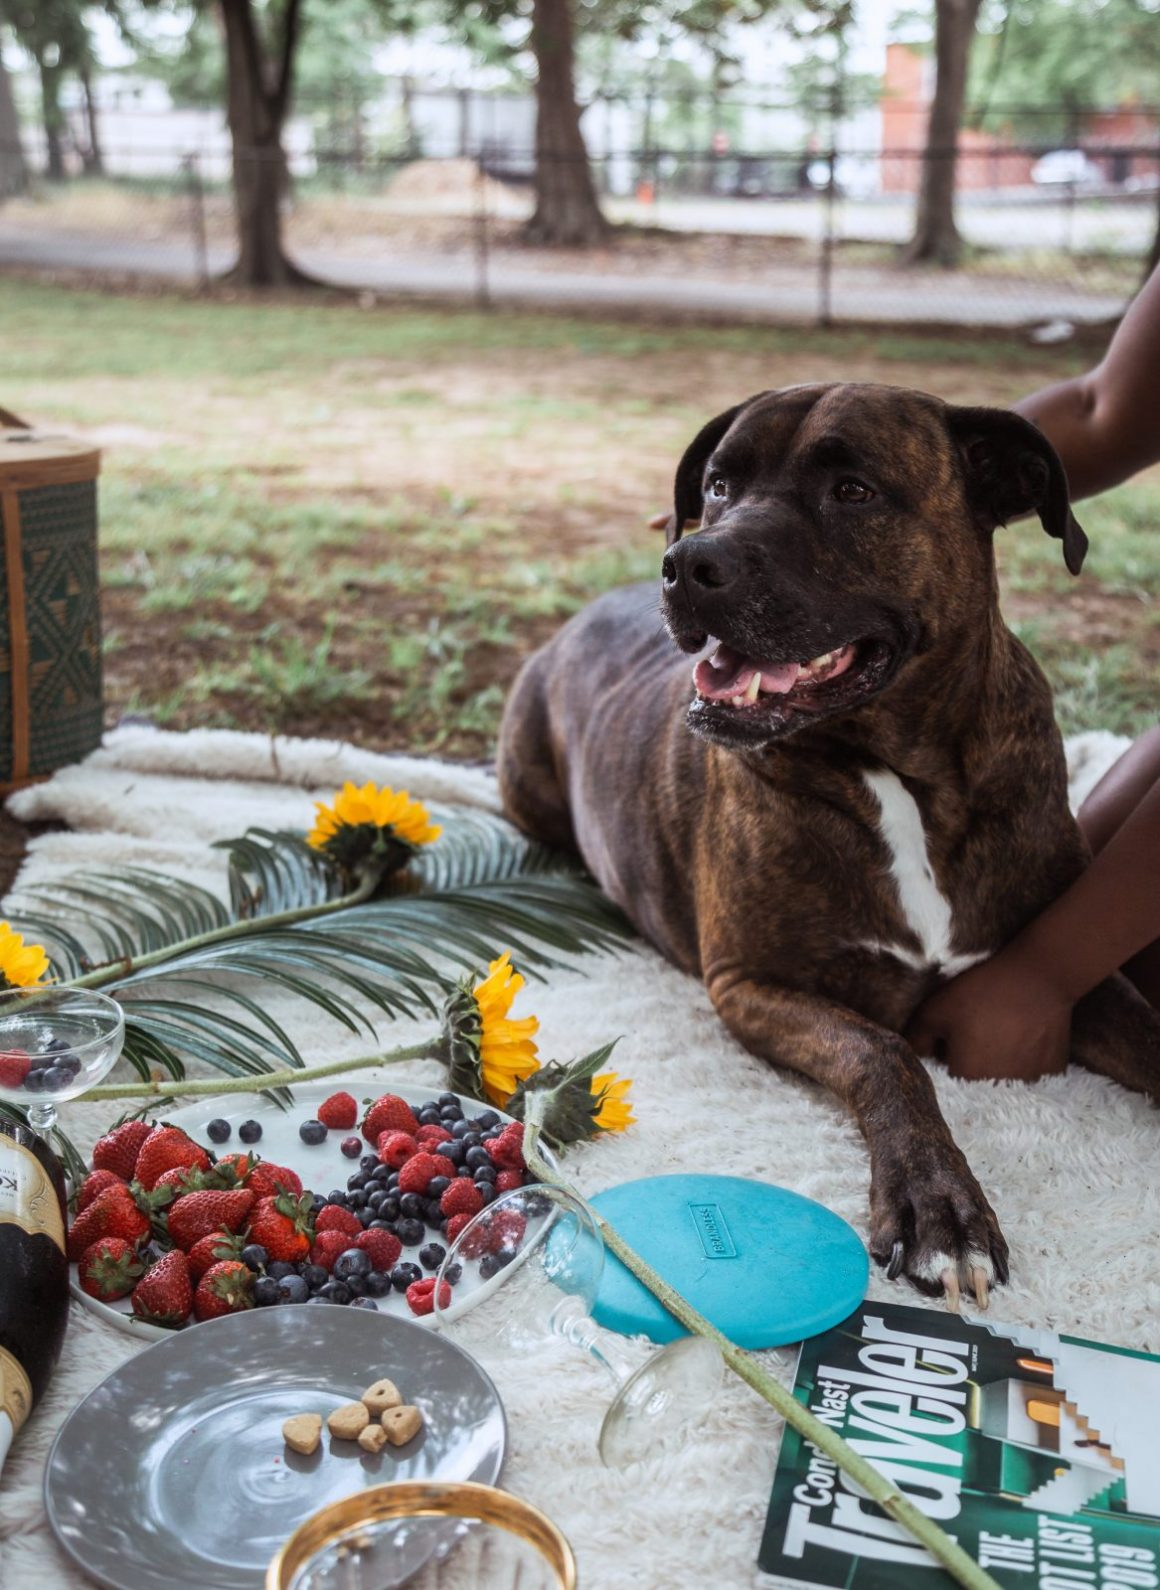 safe fruits and vegetables for your dog